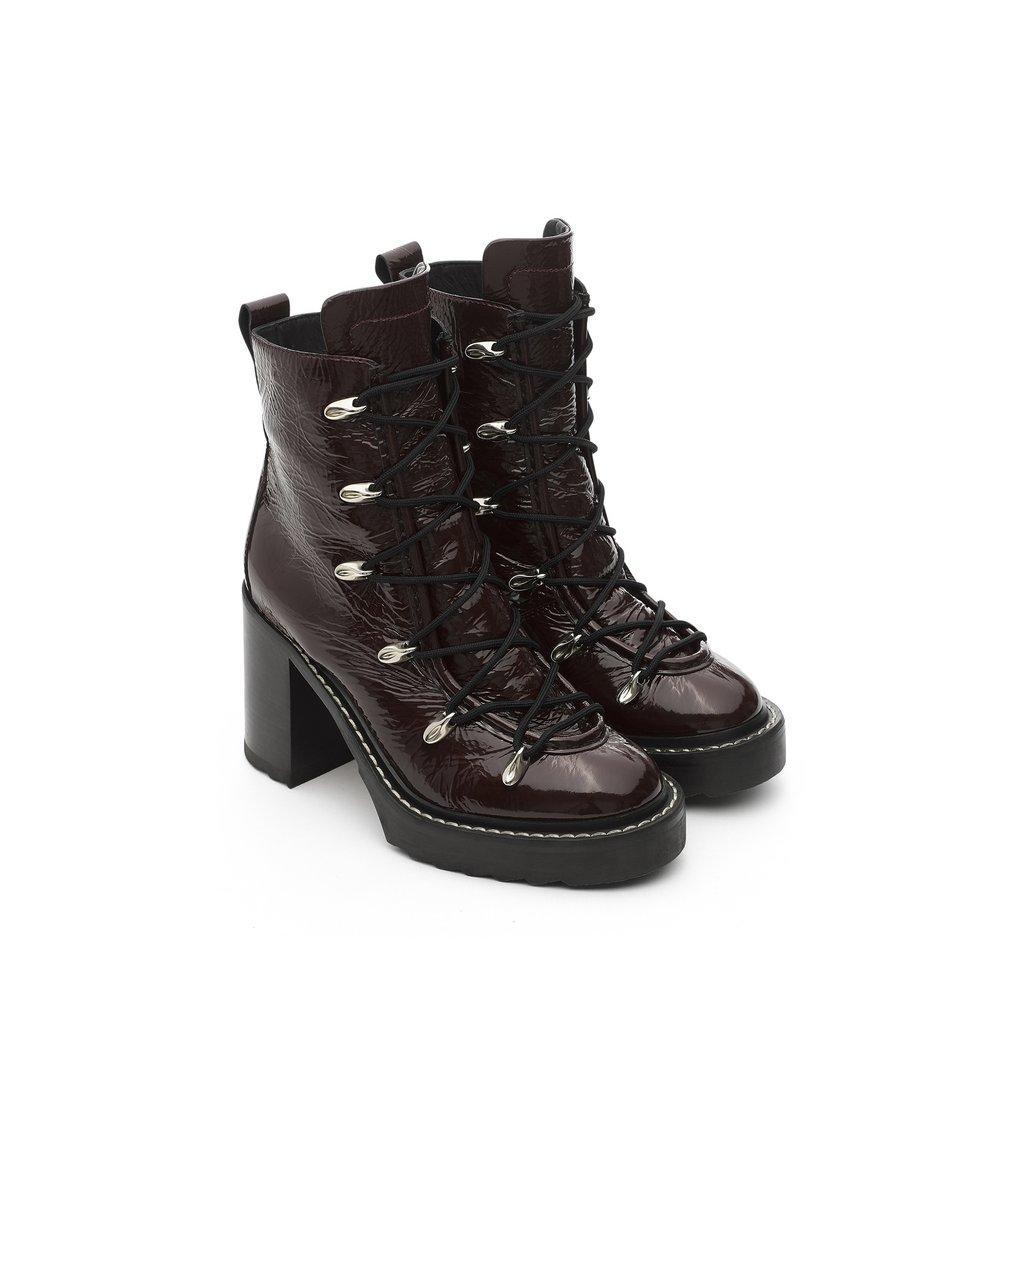 Rag & Bone Sanne Boots